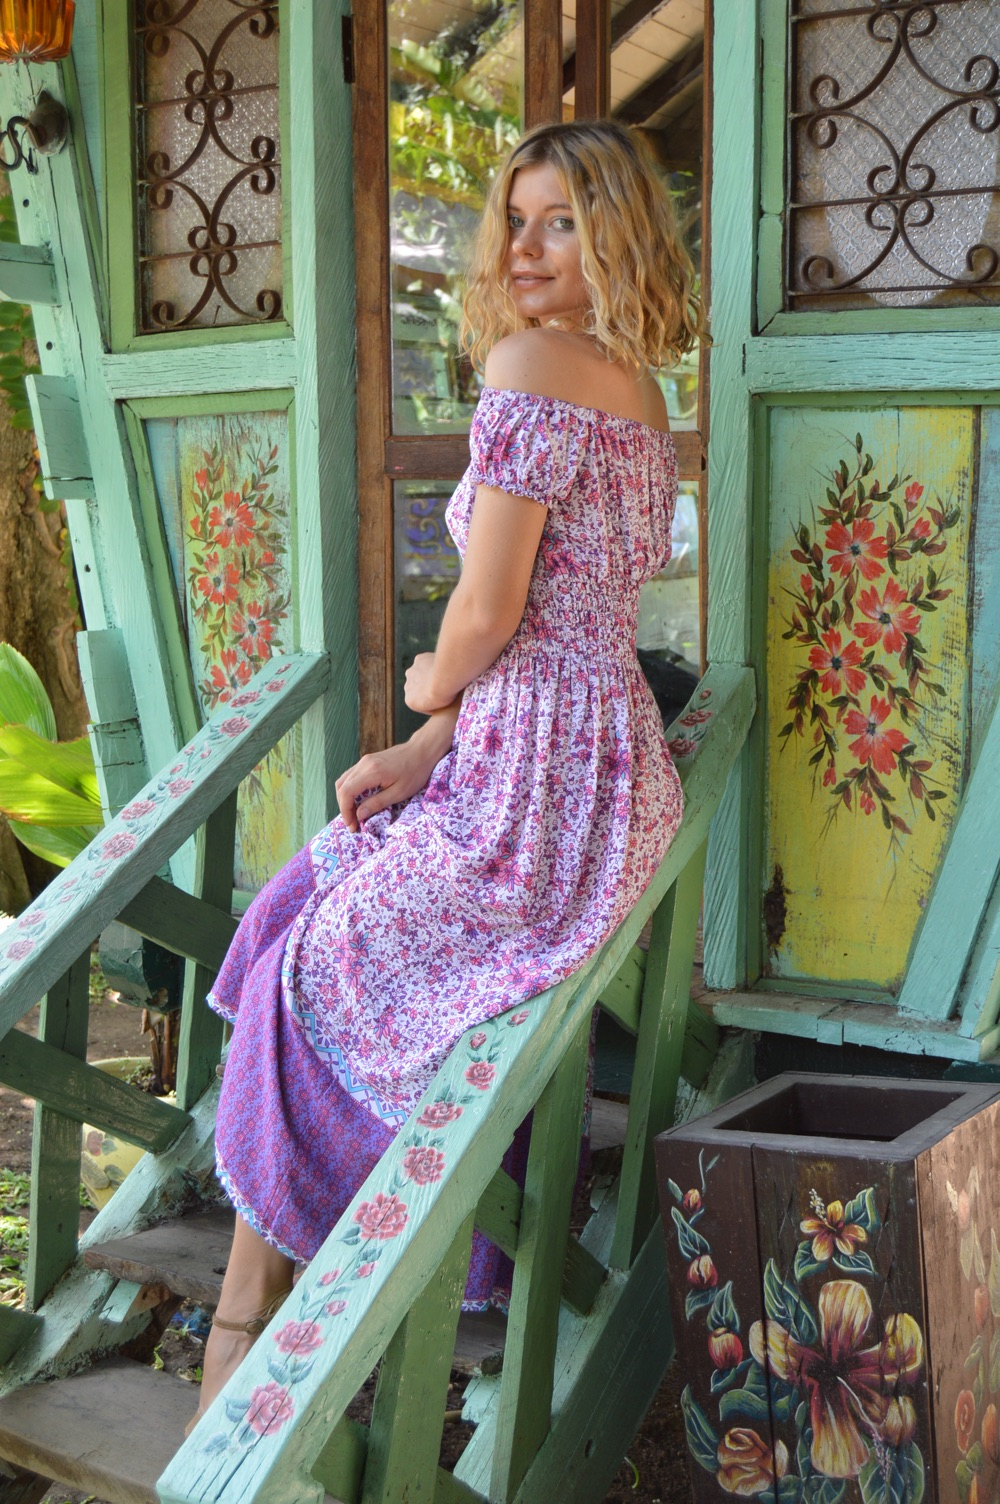 b8ad8d93c vestido romantico lavanda flores lila boho chic